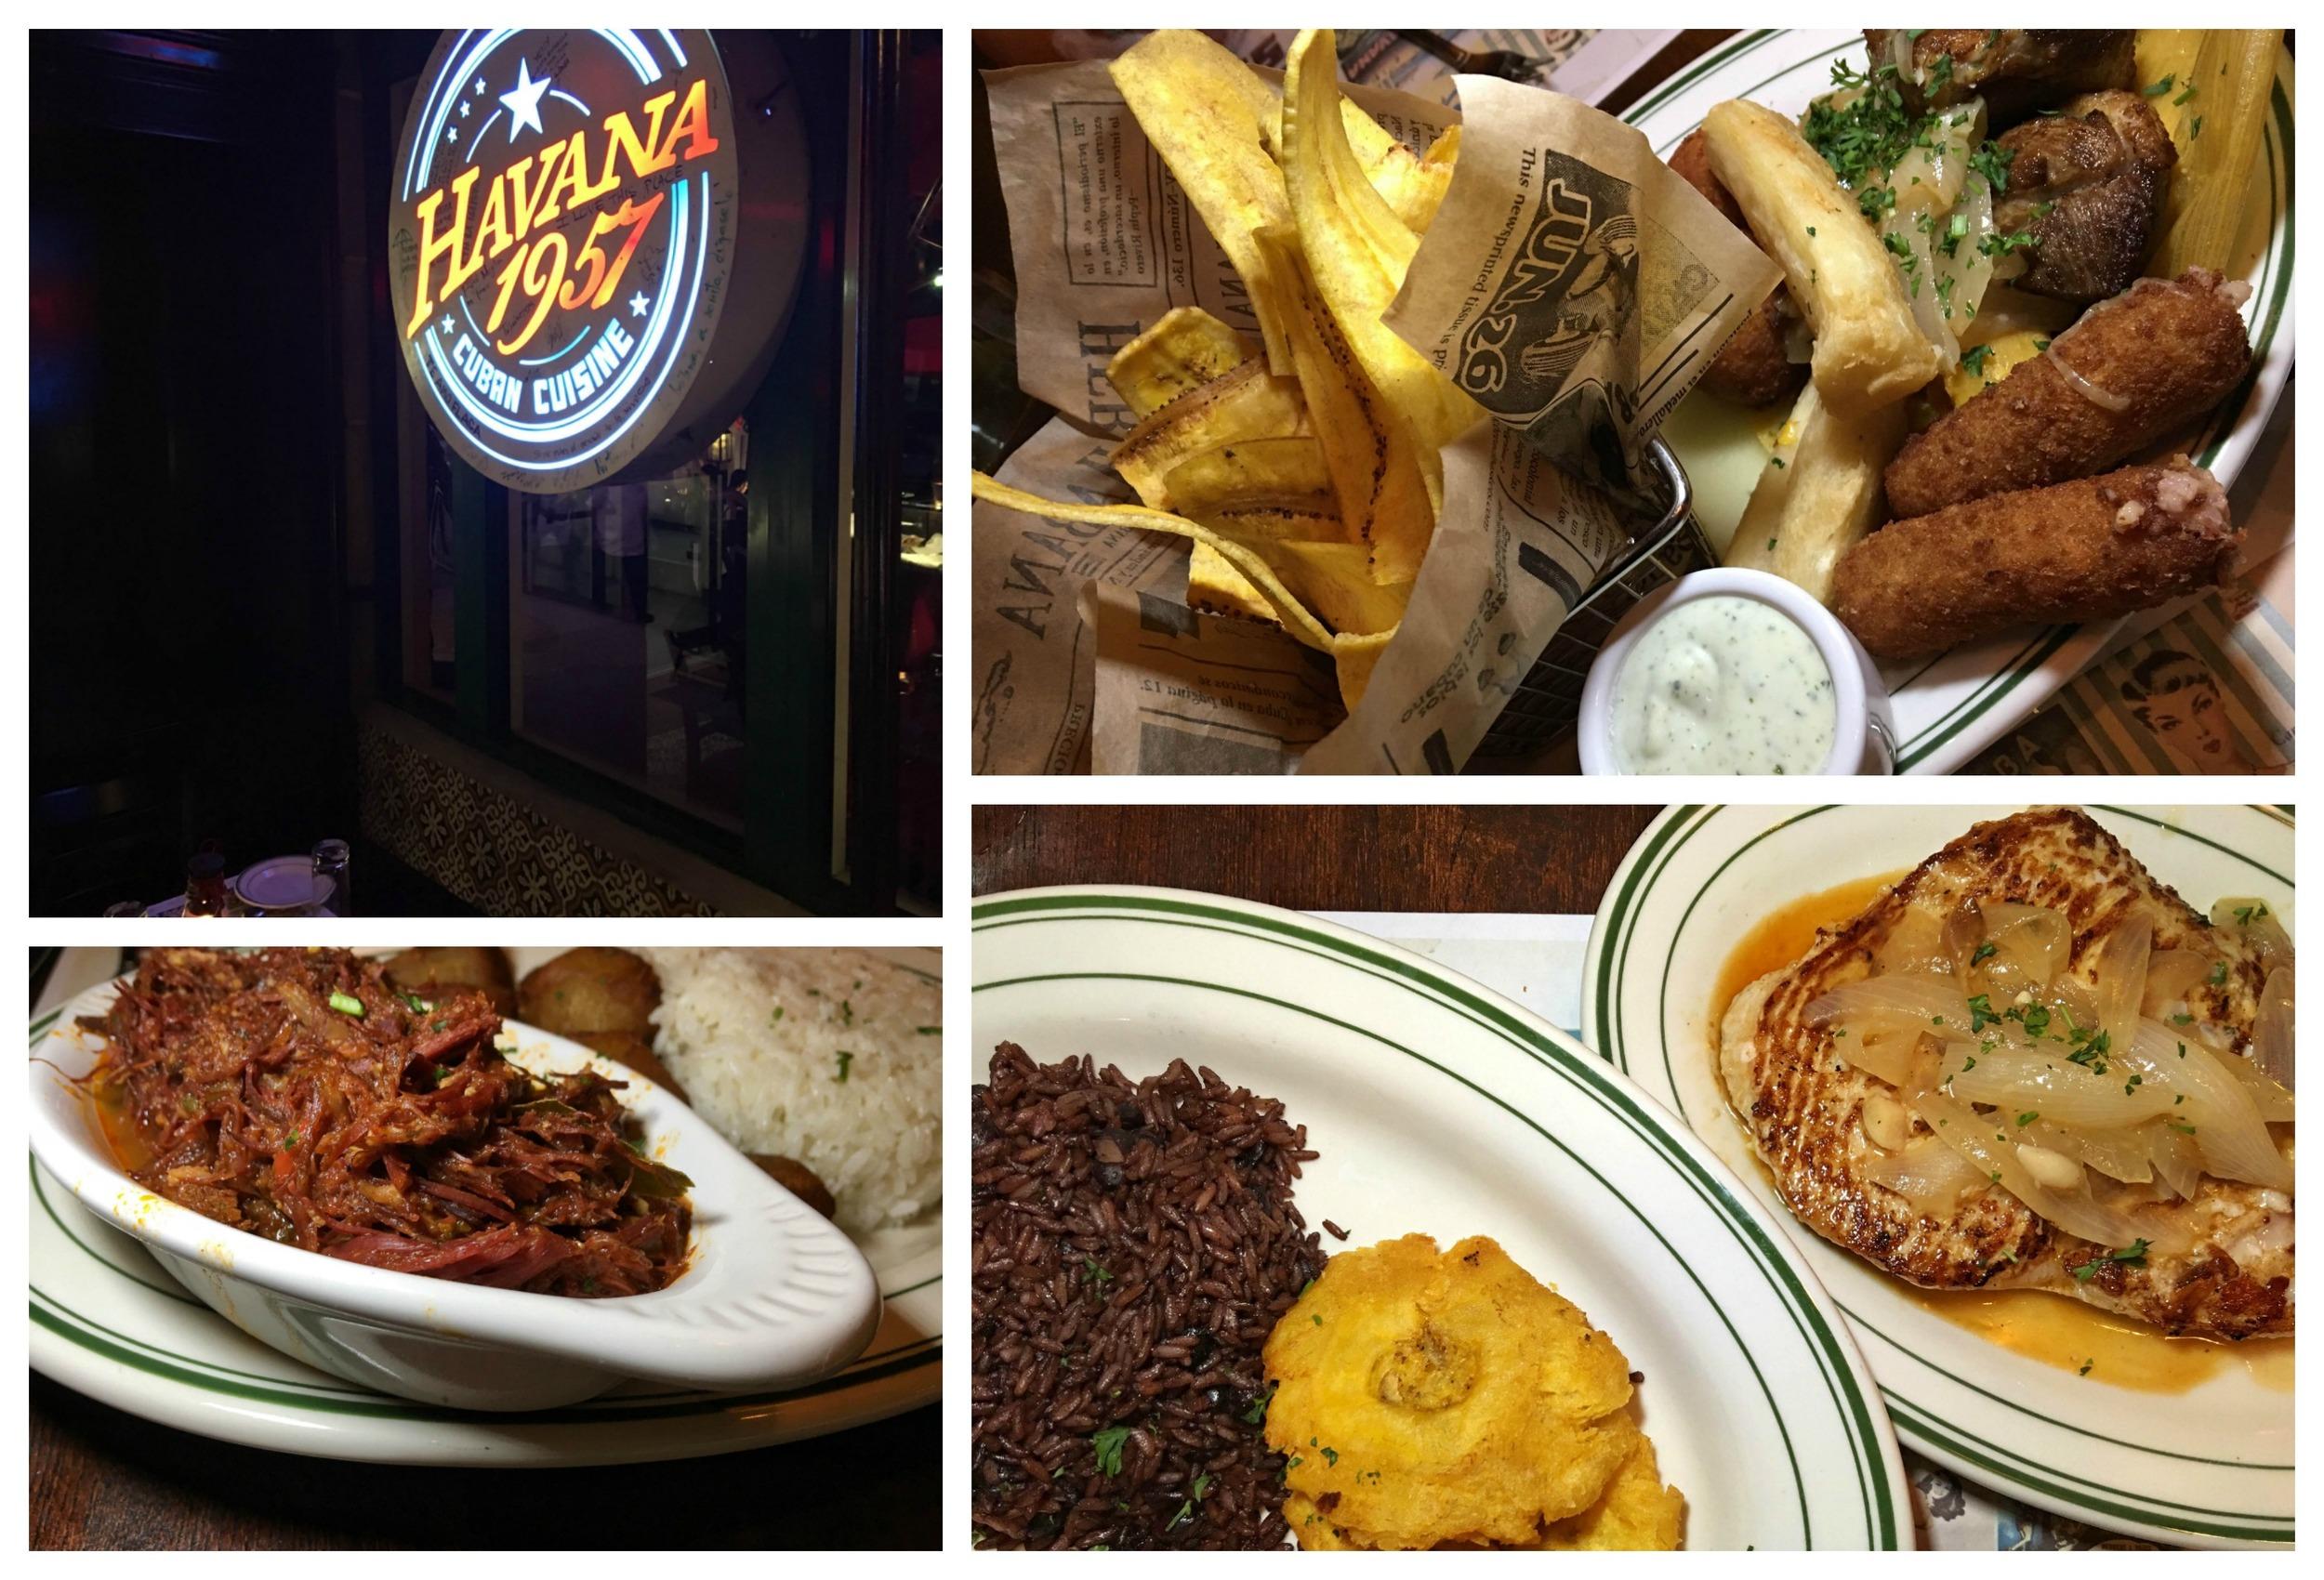 Havana 1957 Cuban Food on Ocean Drive Miami Beach